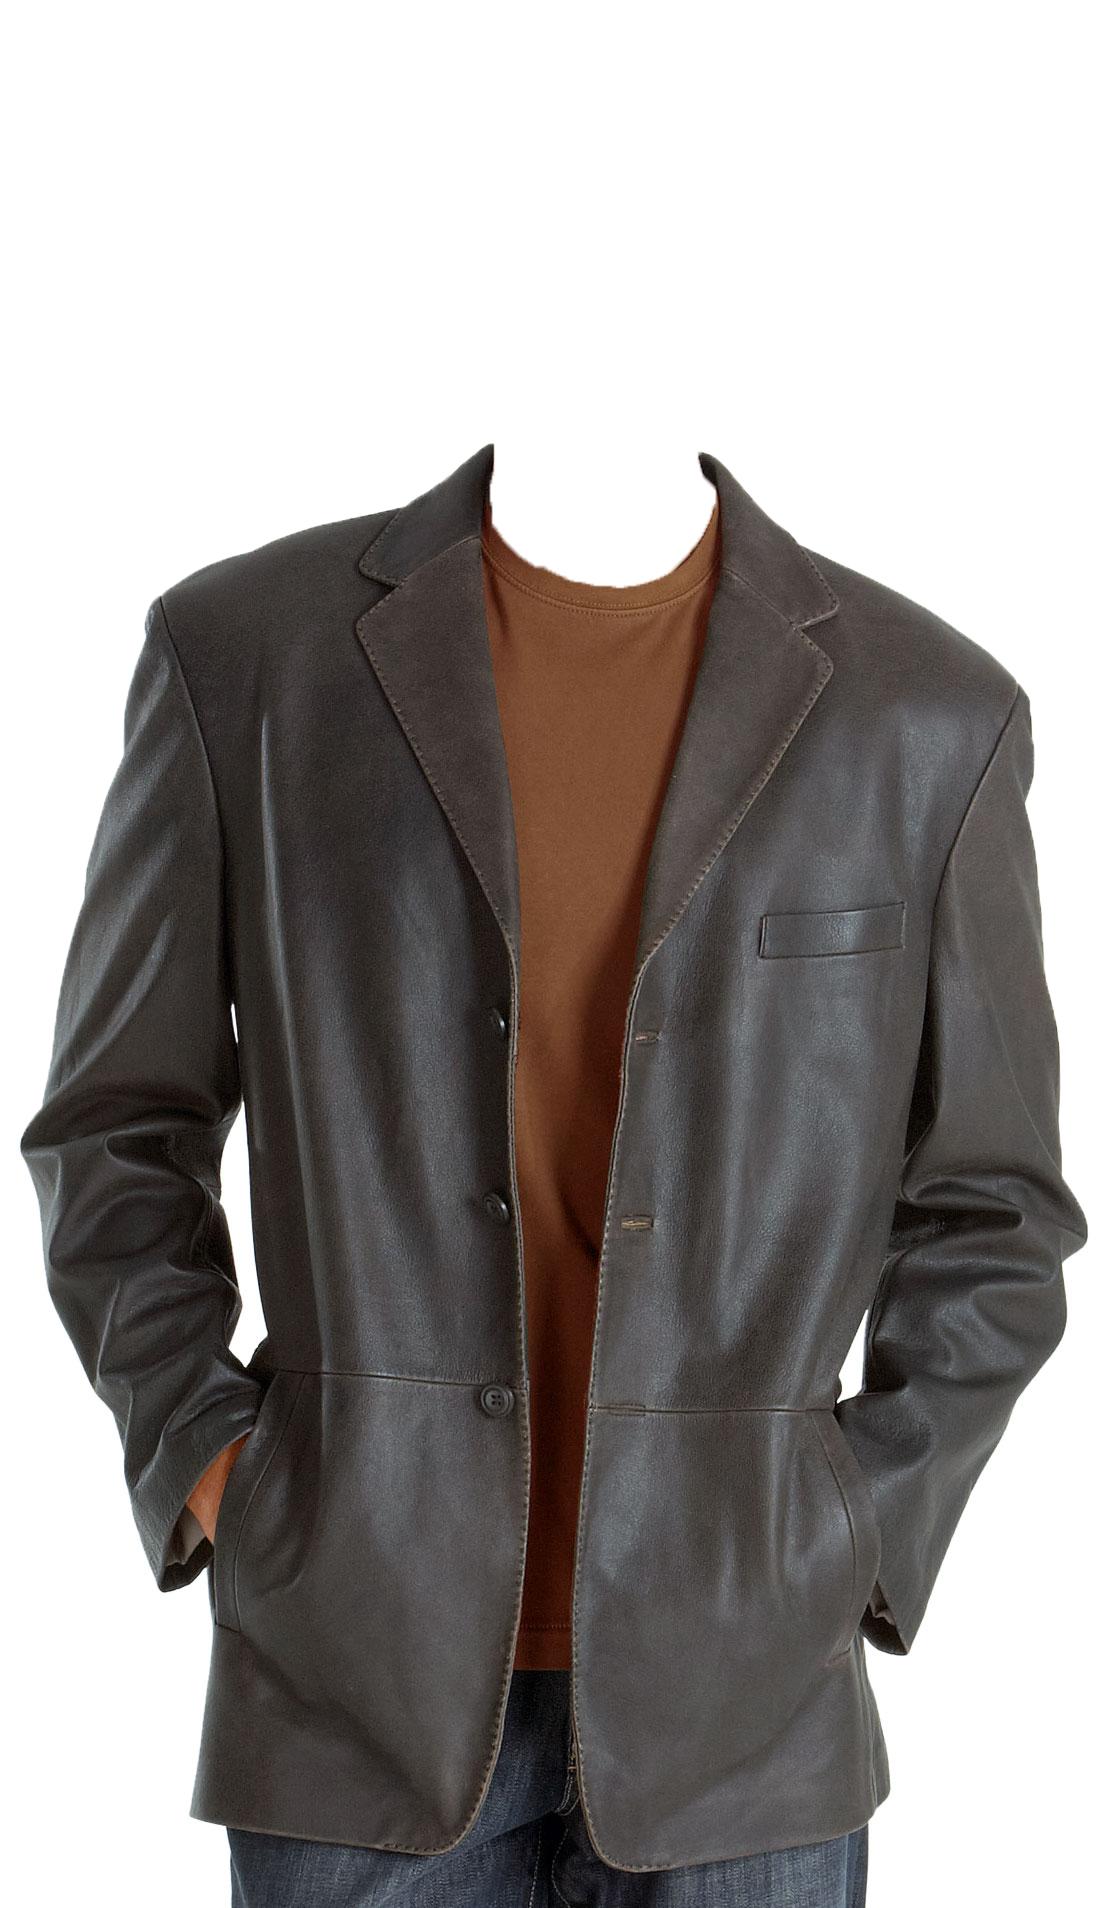 Notch Lapel Collar Mens Leather Blazer Mens Leather Jacket